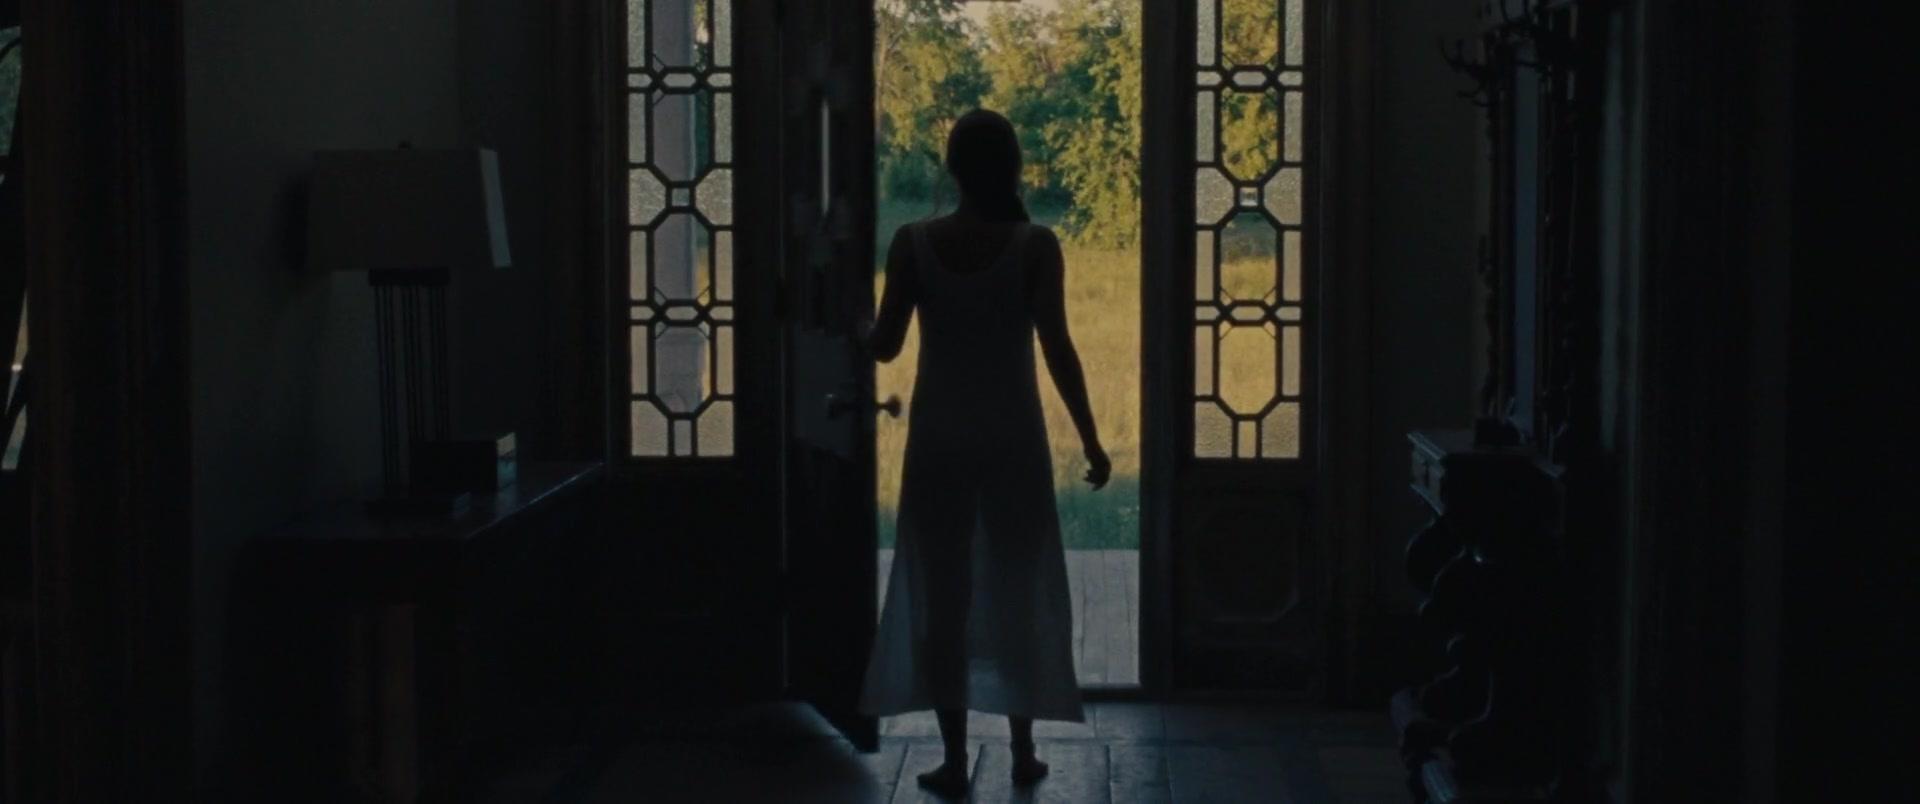 Jennifer-Lawrence-Michelle-Pfeiffer-Mother-9-thefappeningblog.com_.jpg